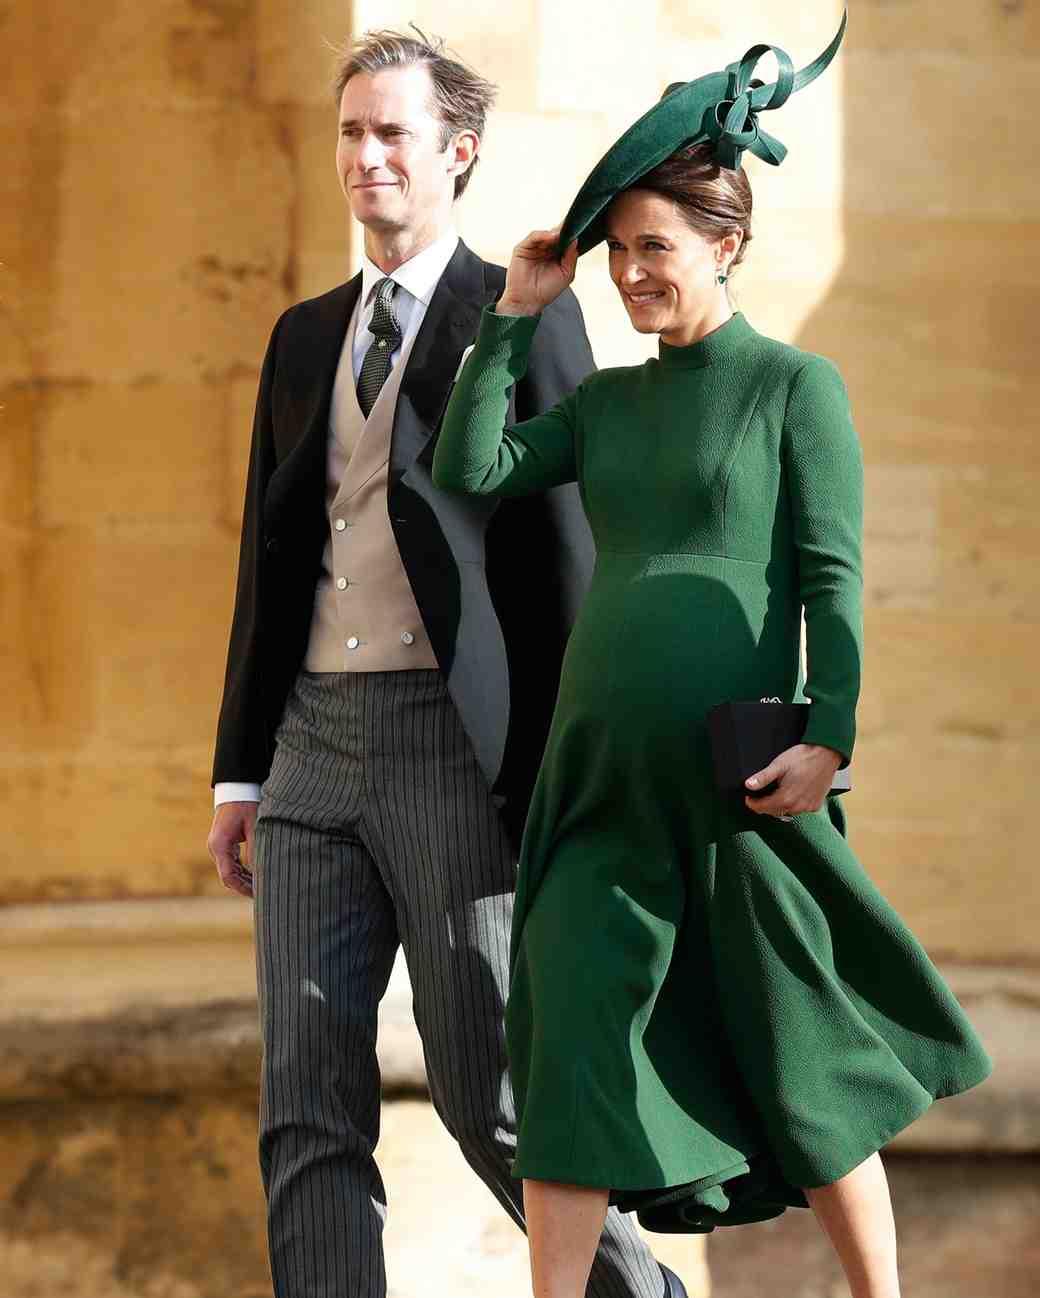 pippa and james matthews arrive at princess eugenie's royal weddinf